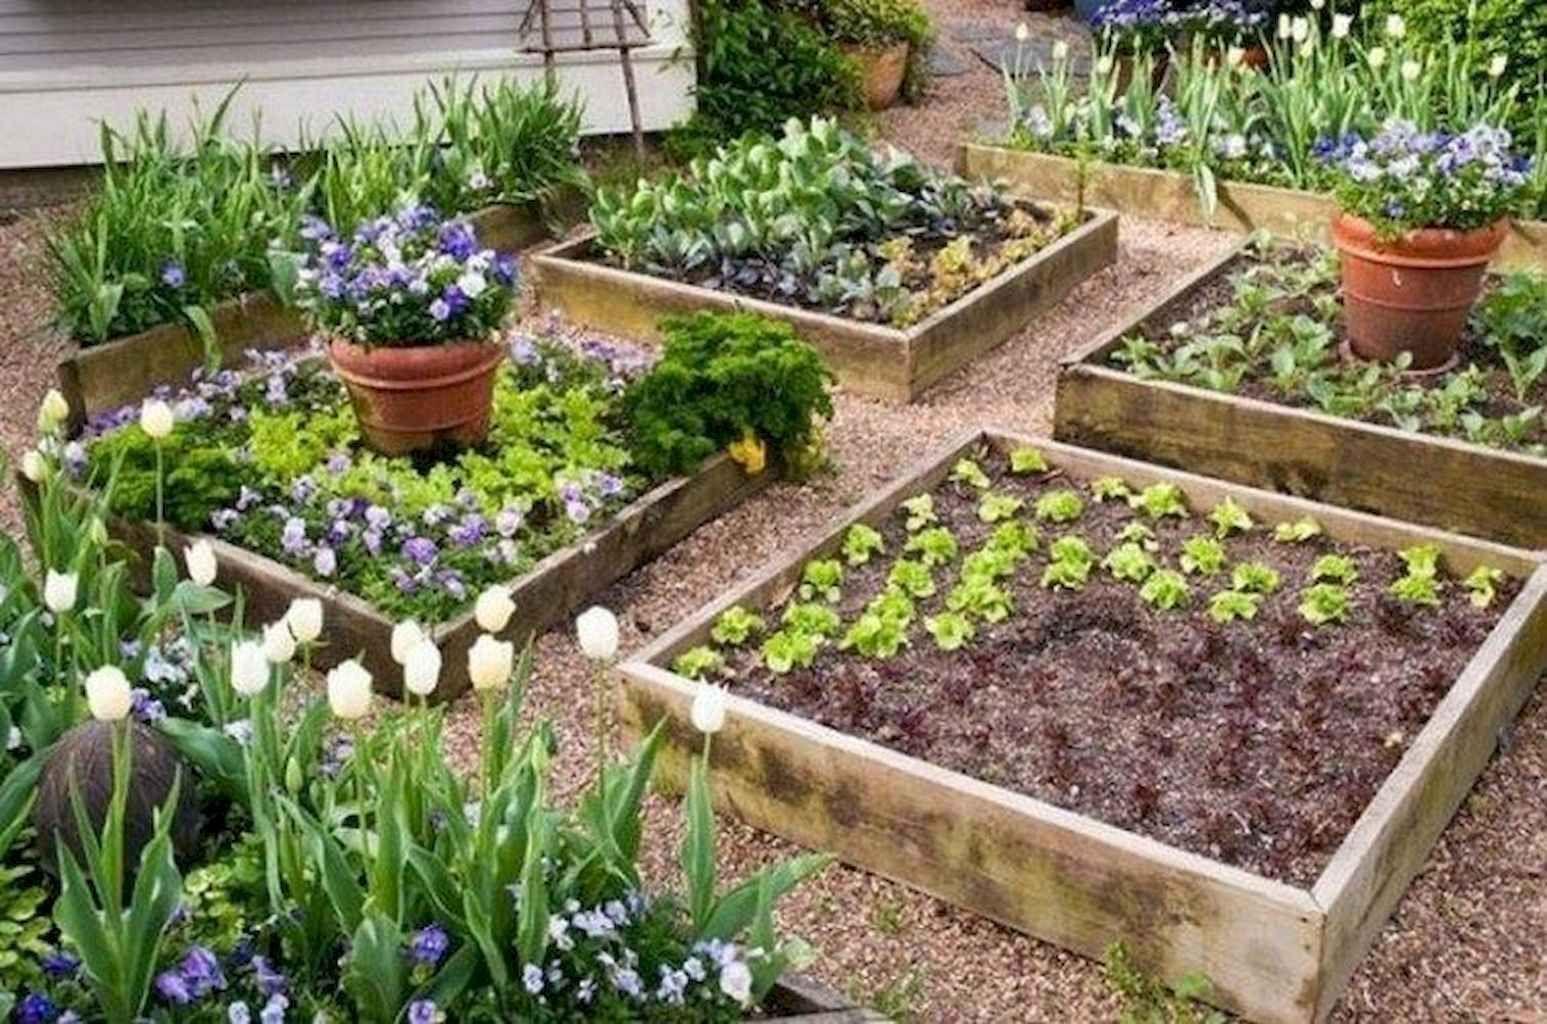 75 Stunning Backyard Vegetable Garden Design Ideas Homekover Garden Layout Vegetable Diy Raised Garden Backyard Vegetable Gardens Backyard garden bed ideas